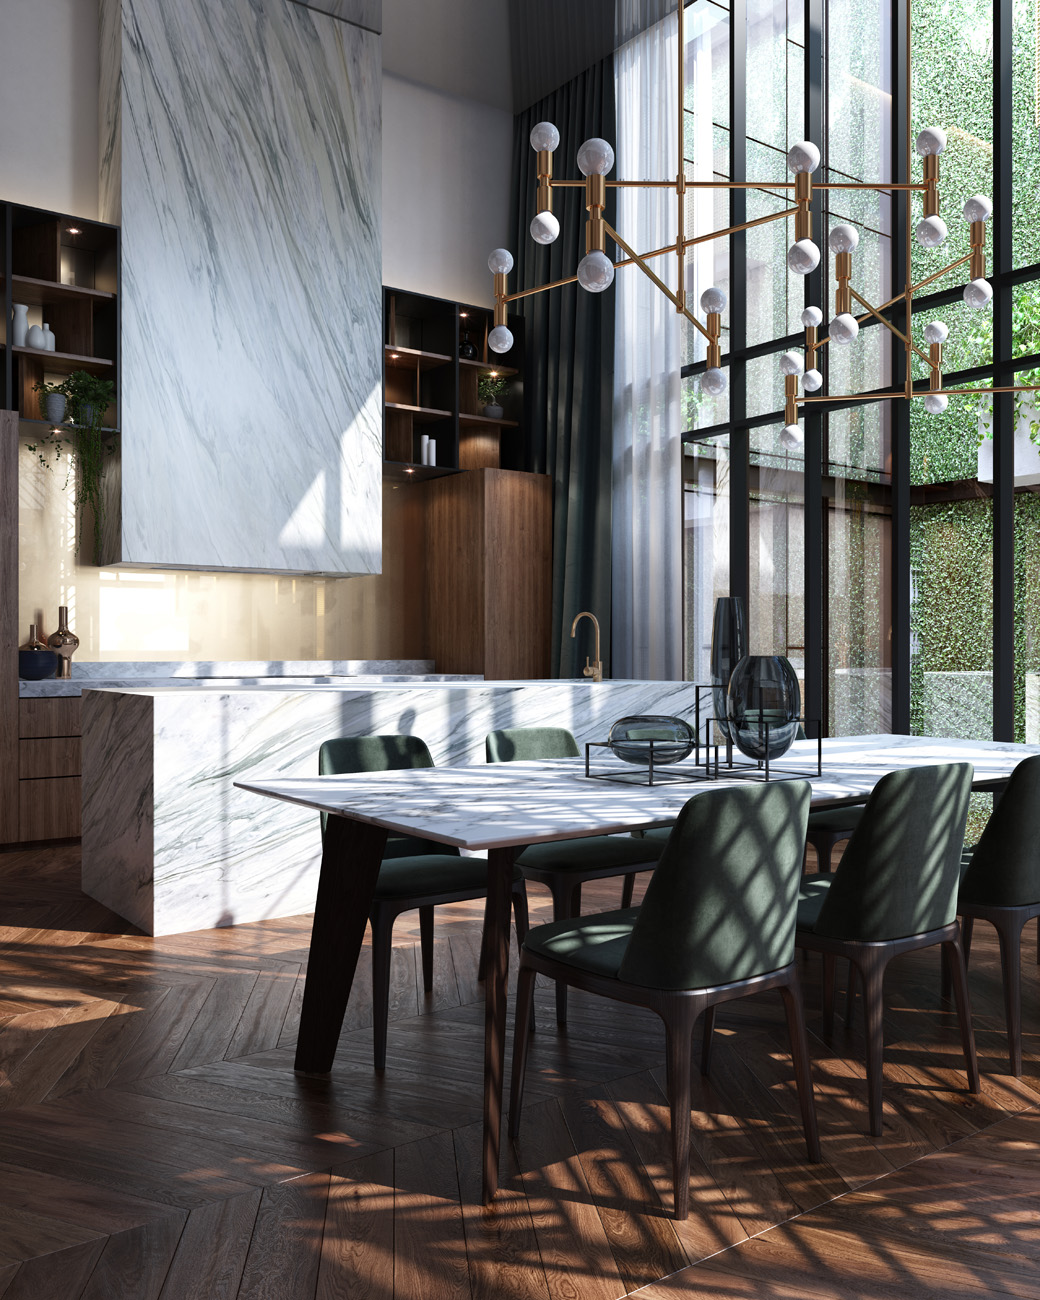 fkd-studio-Yarra-One-building-3d-image-visualisation-melbourne-FKD-Studio-dining-interiors